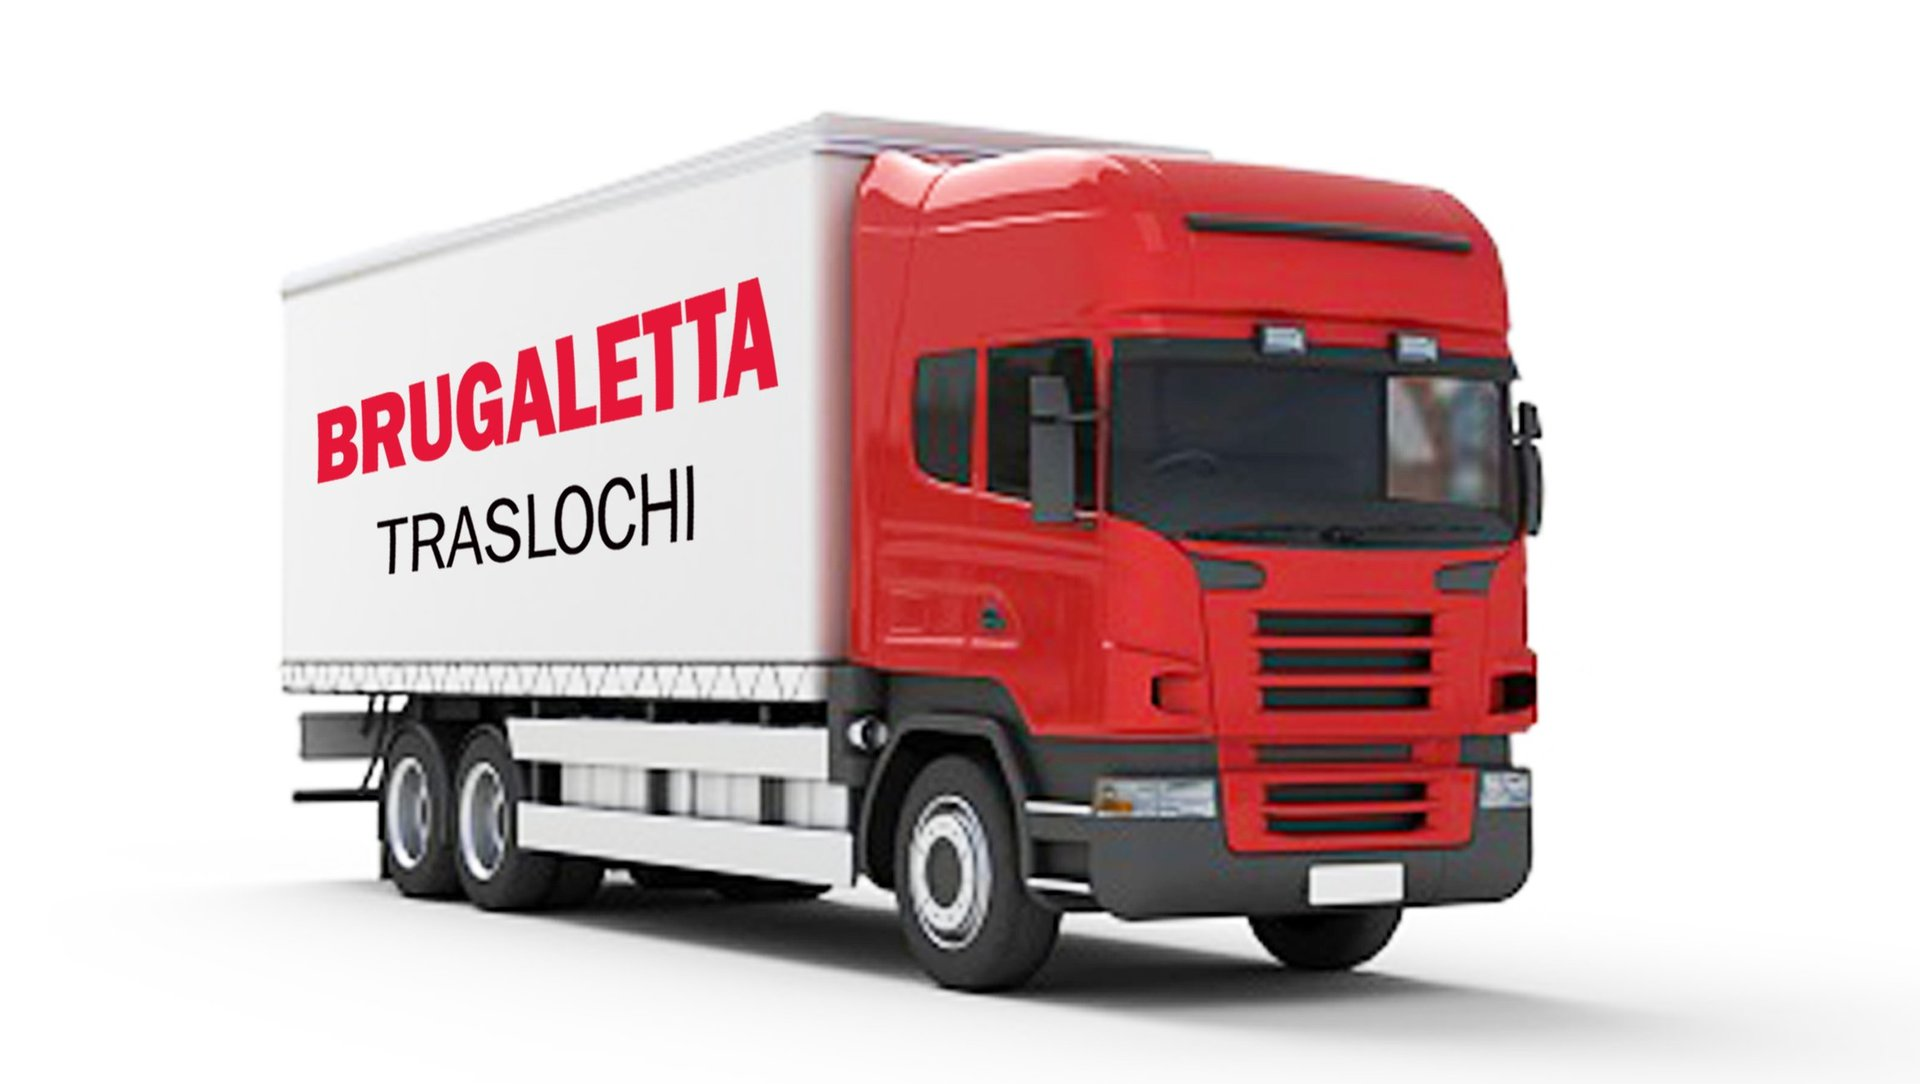 Brugaletta Aldo Traslochi